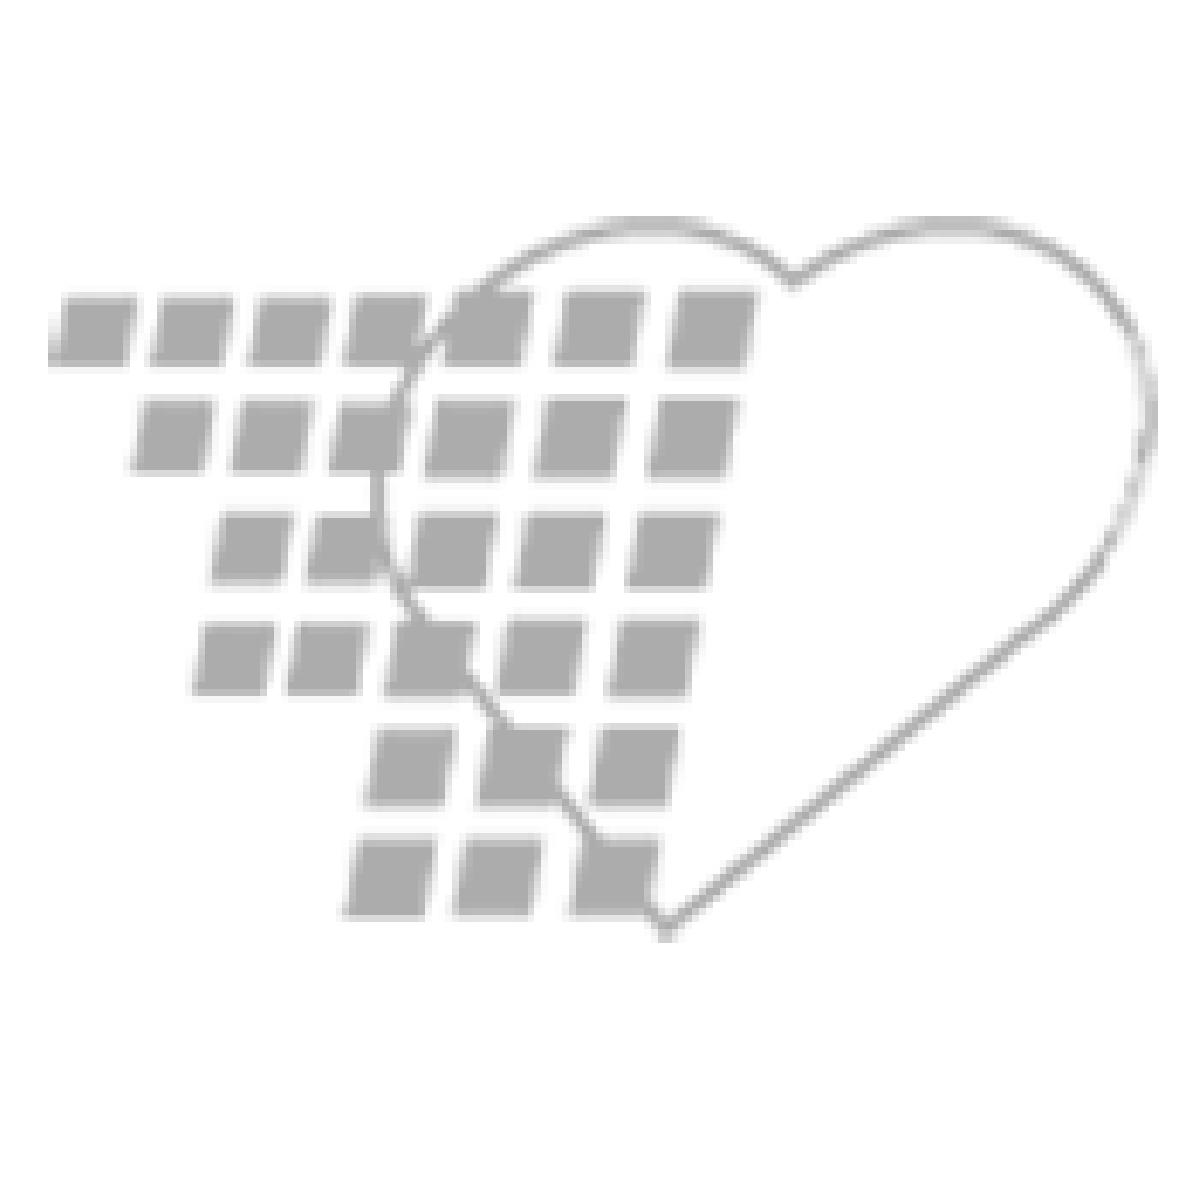 05-41-1739 - HolliHesive Paste - 2 oz